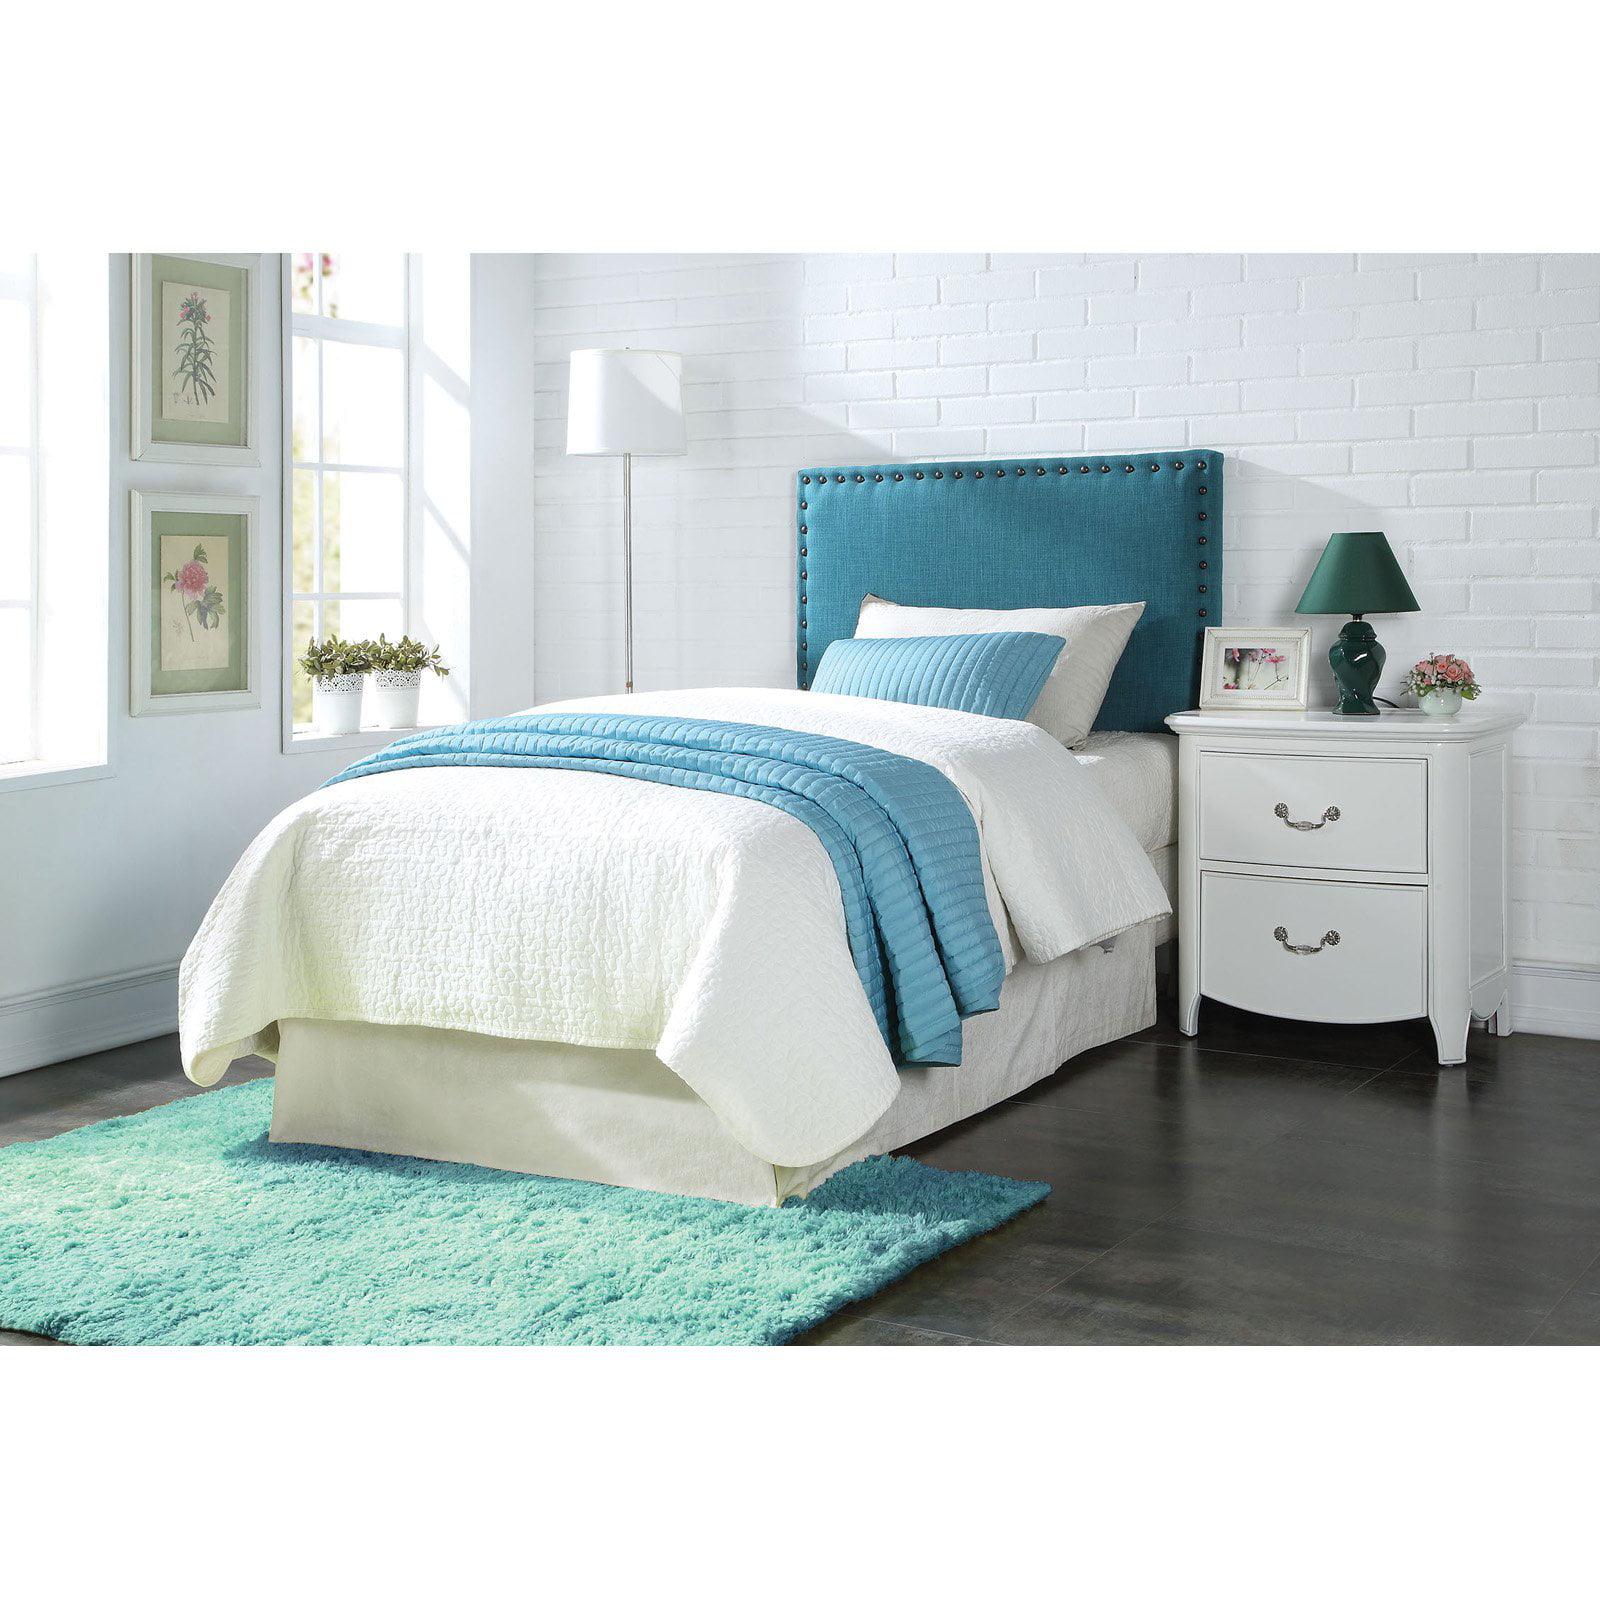 Acme furniture sabina linen twin headboard blue walmart com